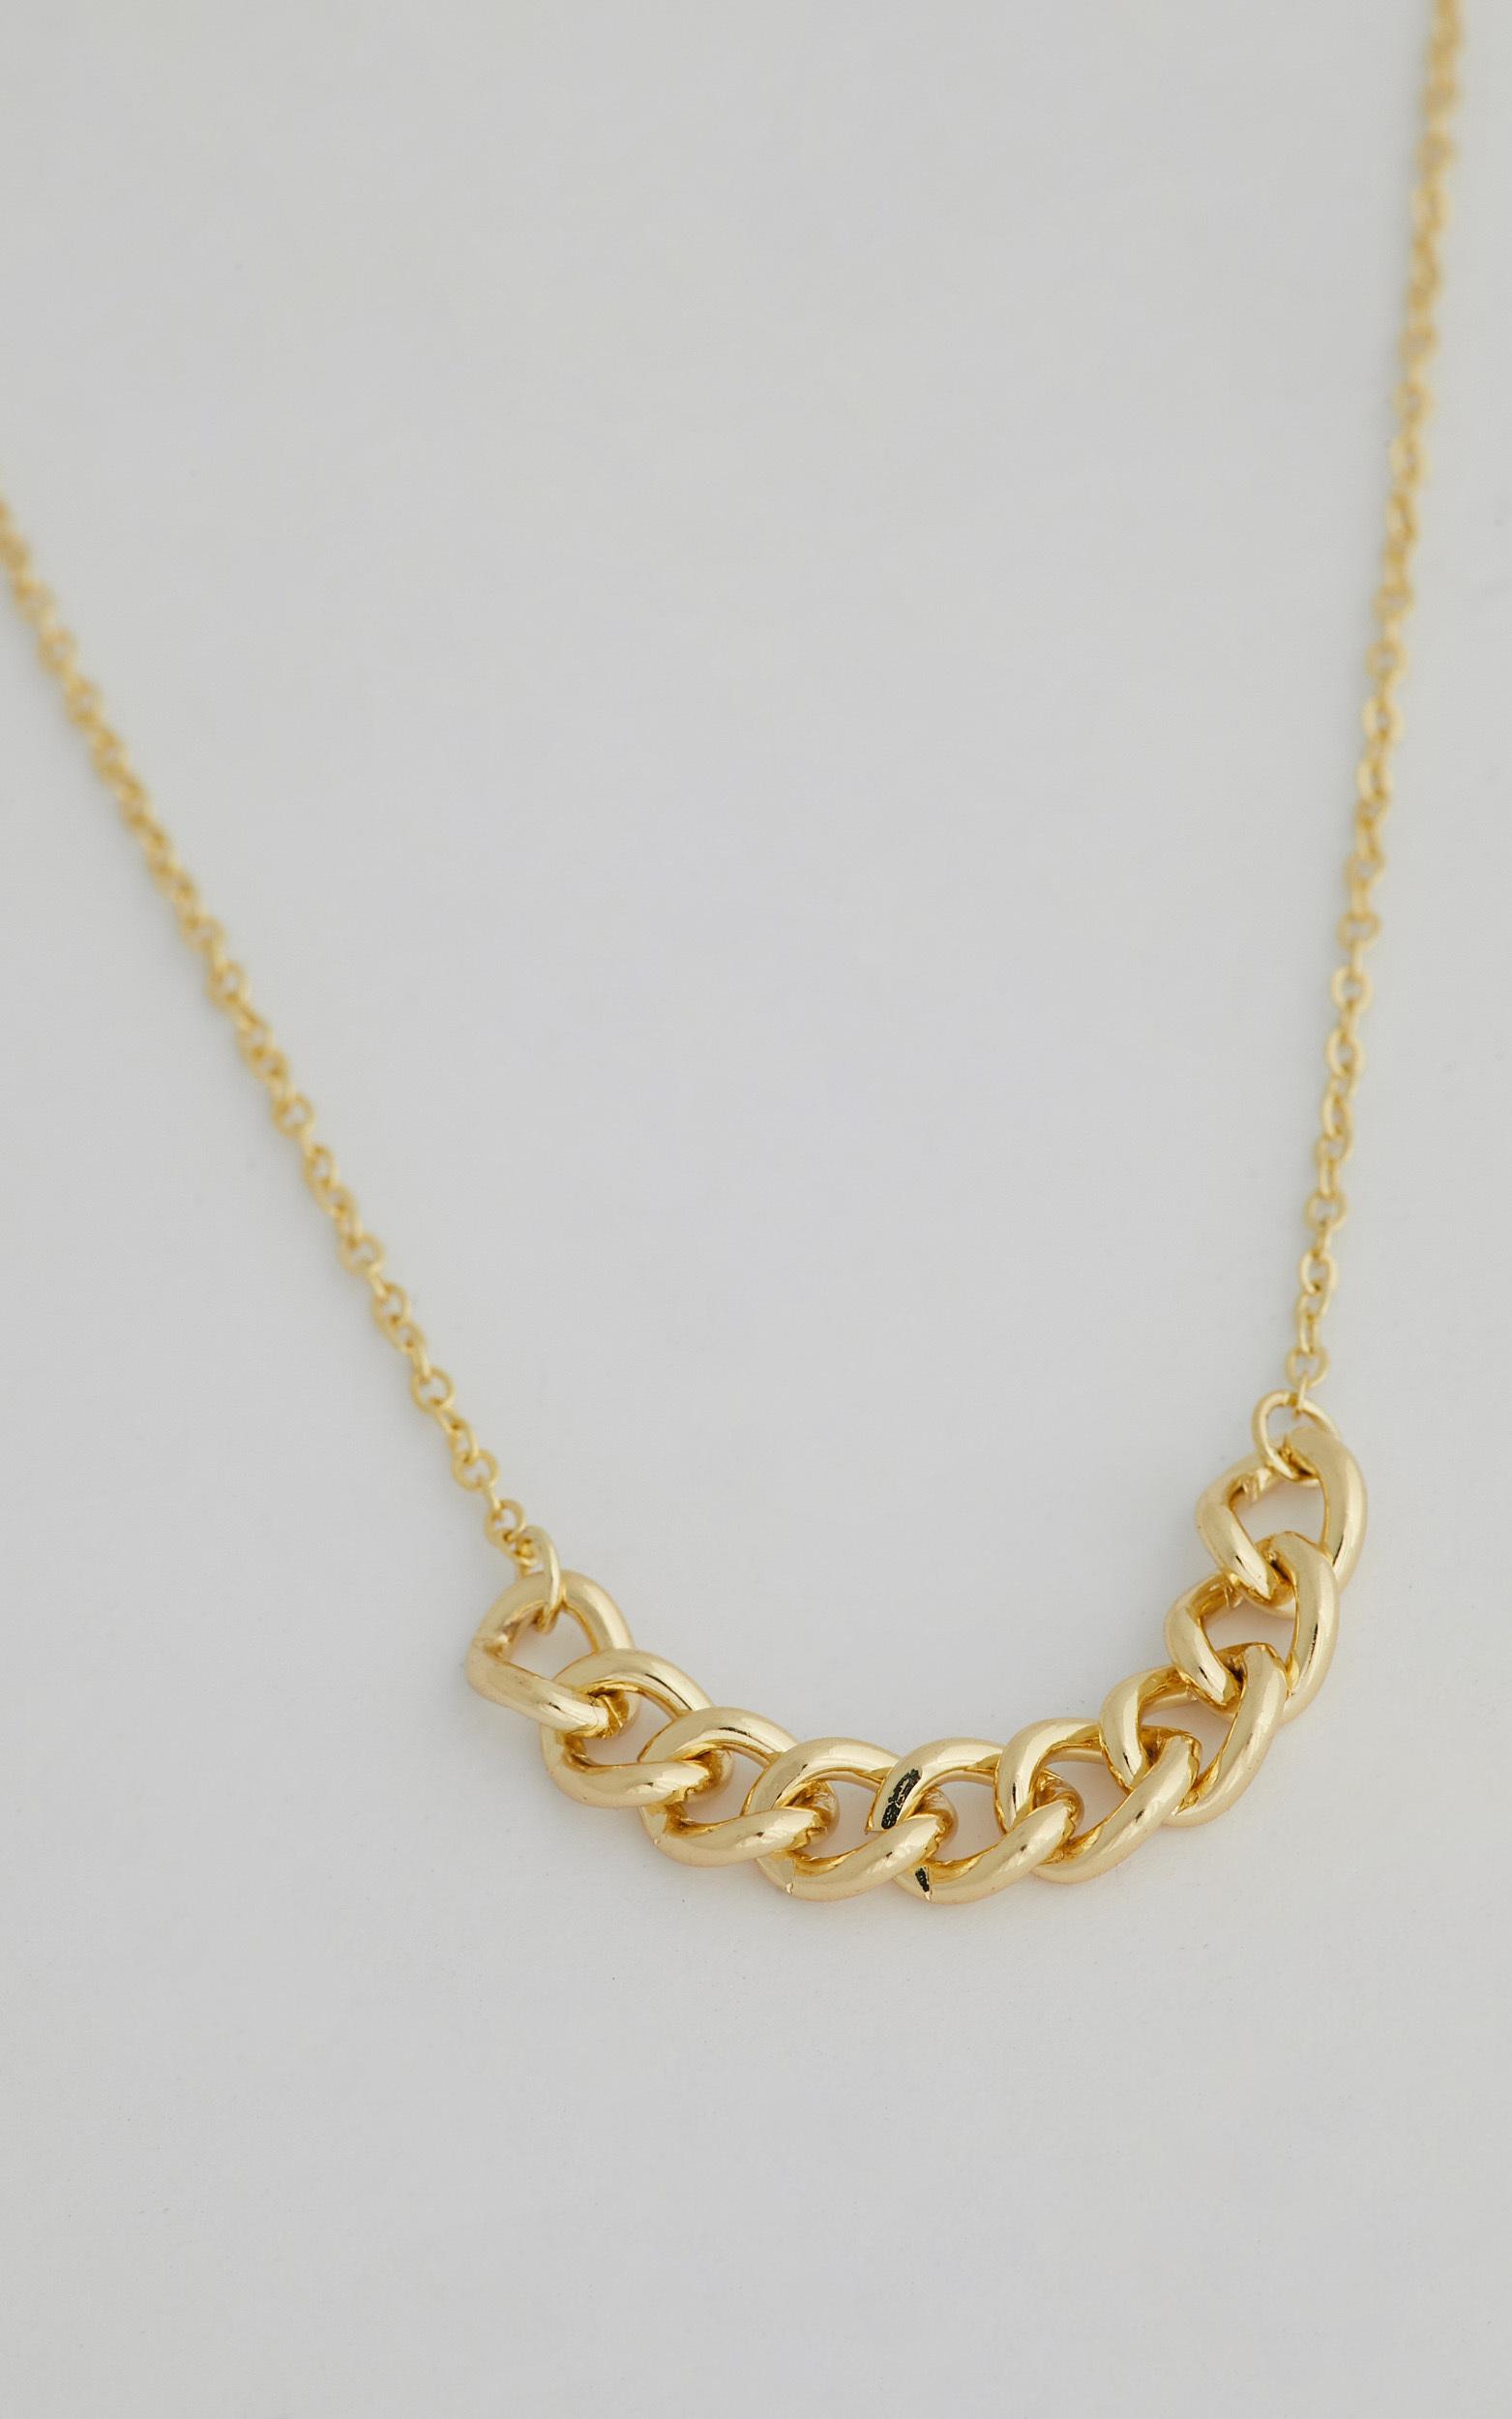 LEESA NECKLACE in Gold - NoSize, GLD1, hi-res image number null